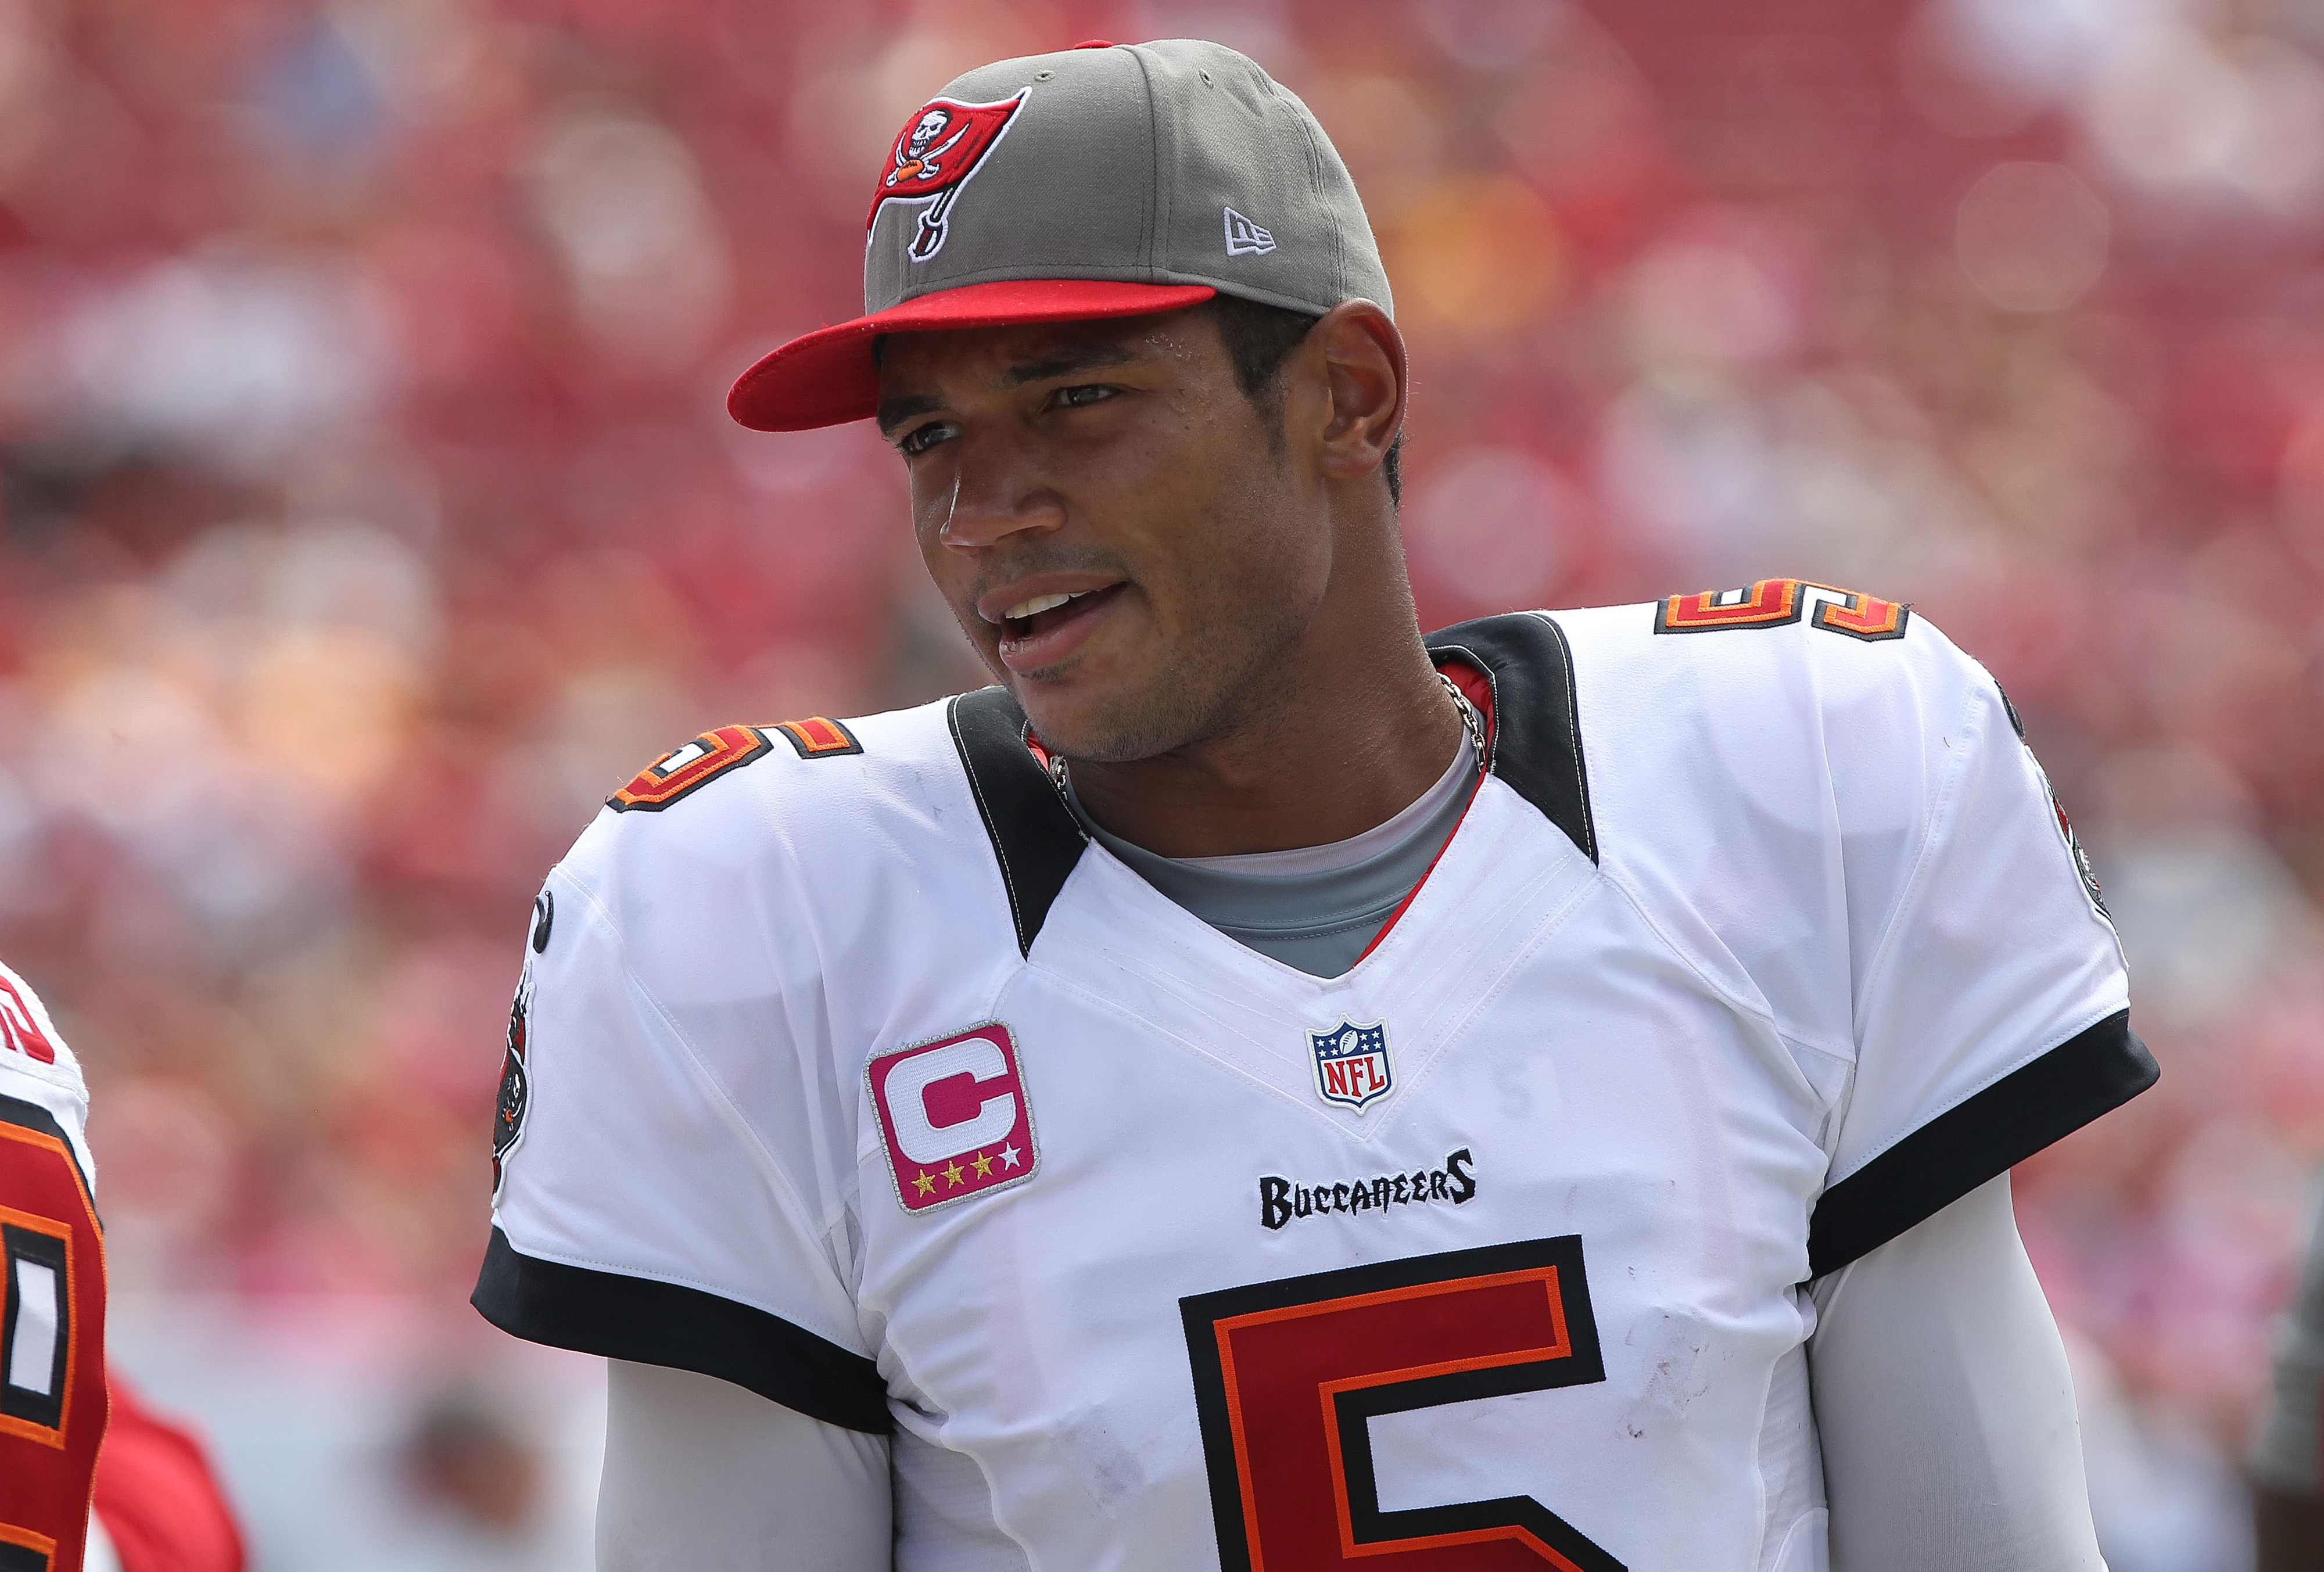 Josh Freeman in stage 1 of NFL's drug program, according to report